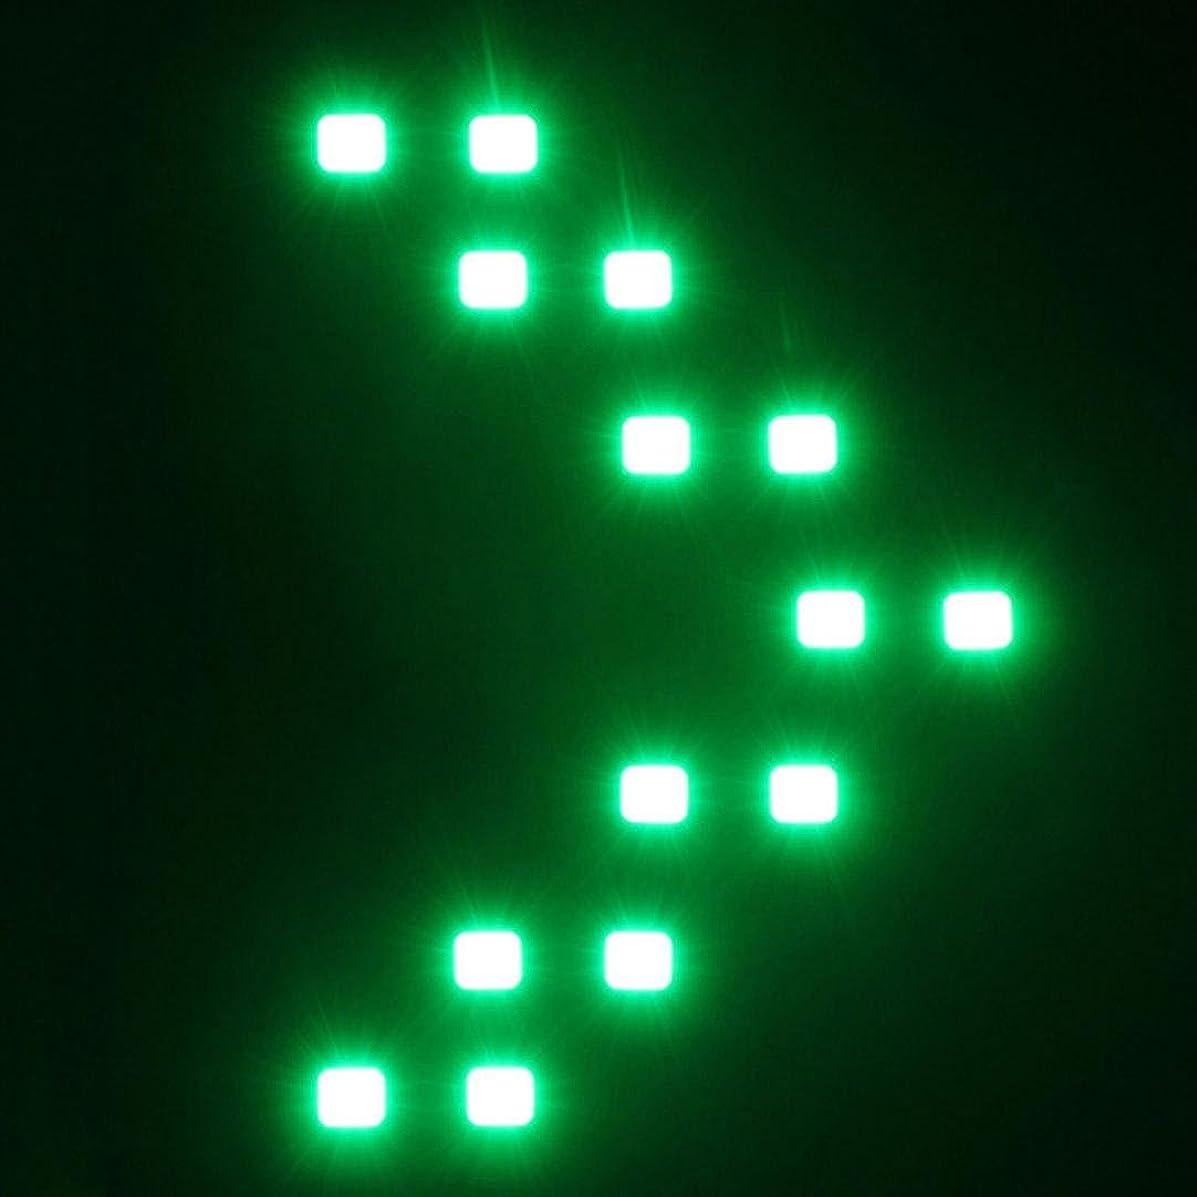 Quaanti Turn Signal Car Light,2 Pcs/lot 14 SMD LED Arrow Panel for Car Rear View Mirror Indicator Car LED Rearview Mirror Light (Green)